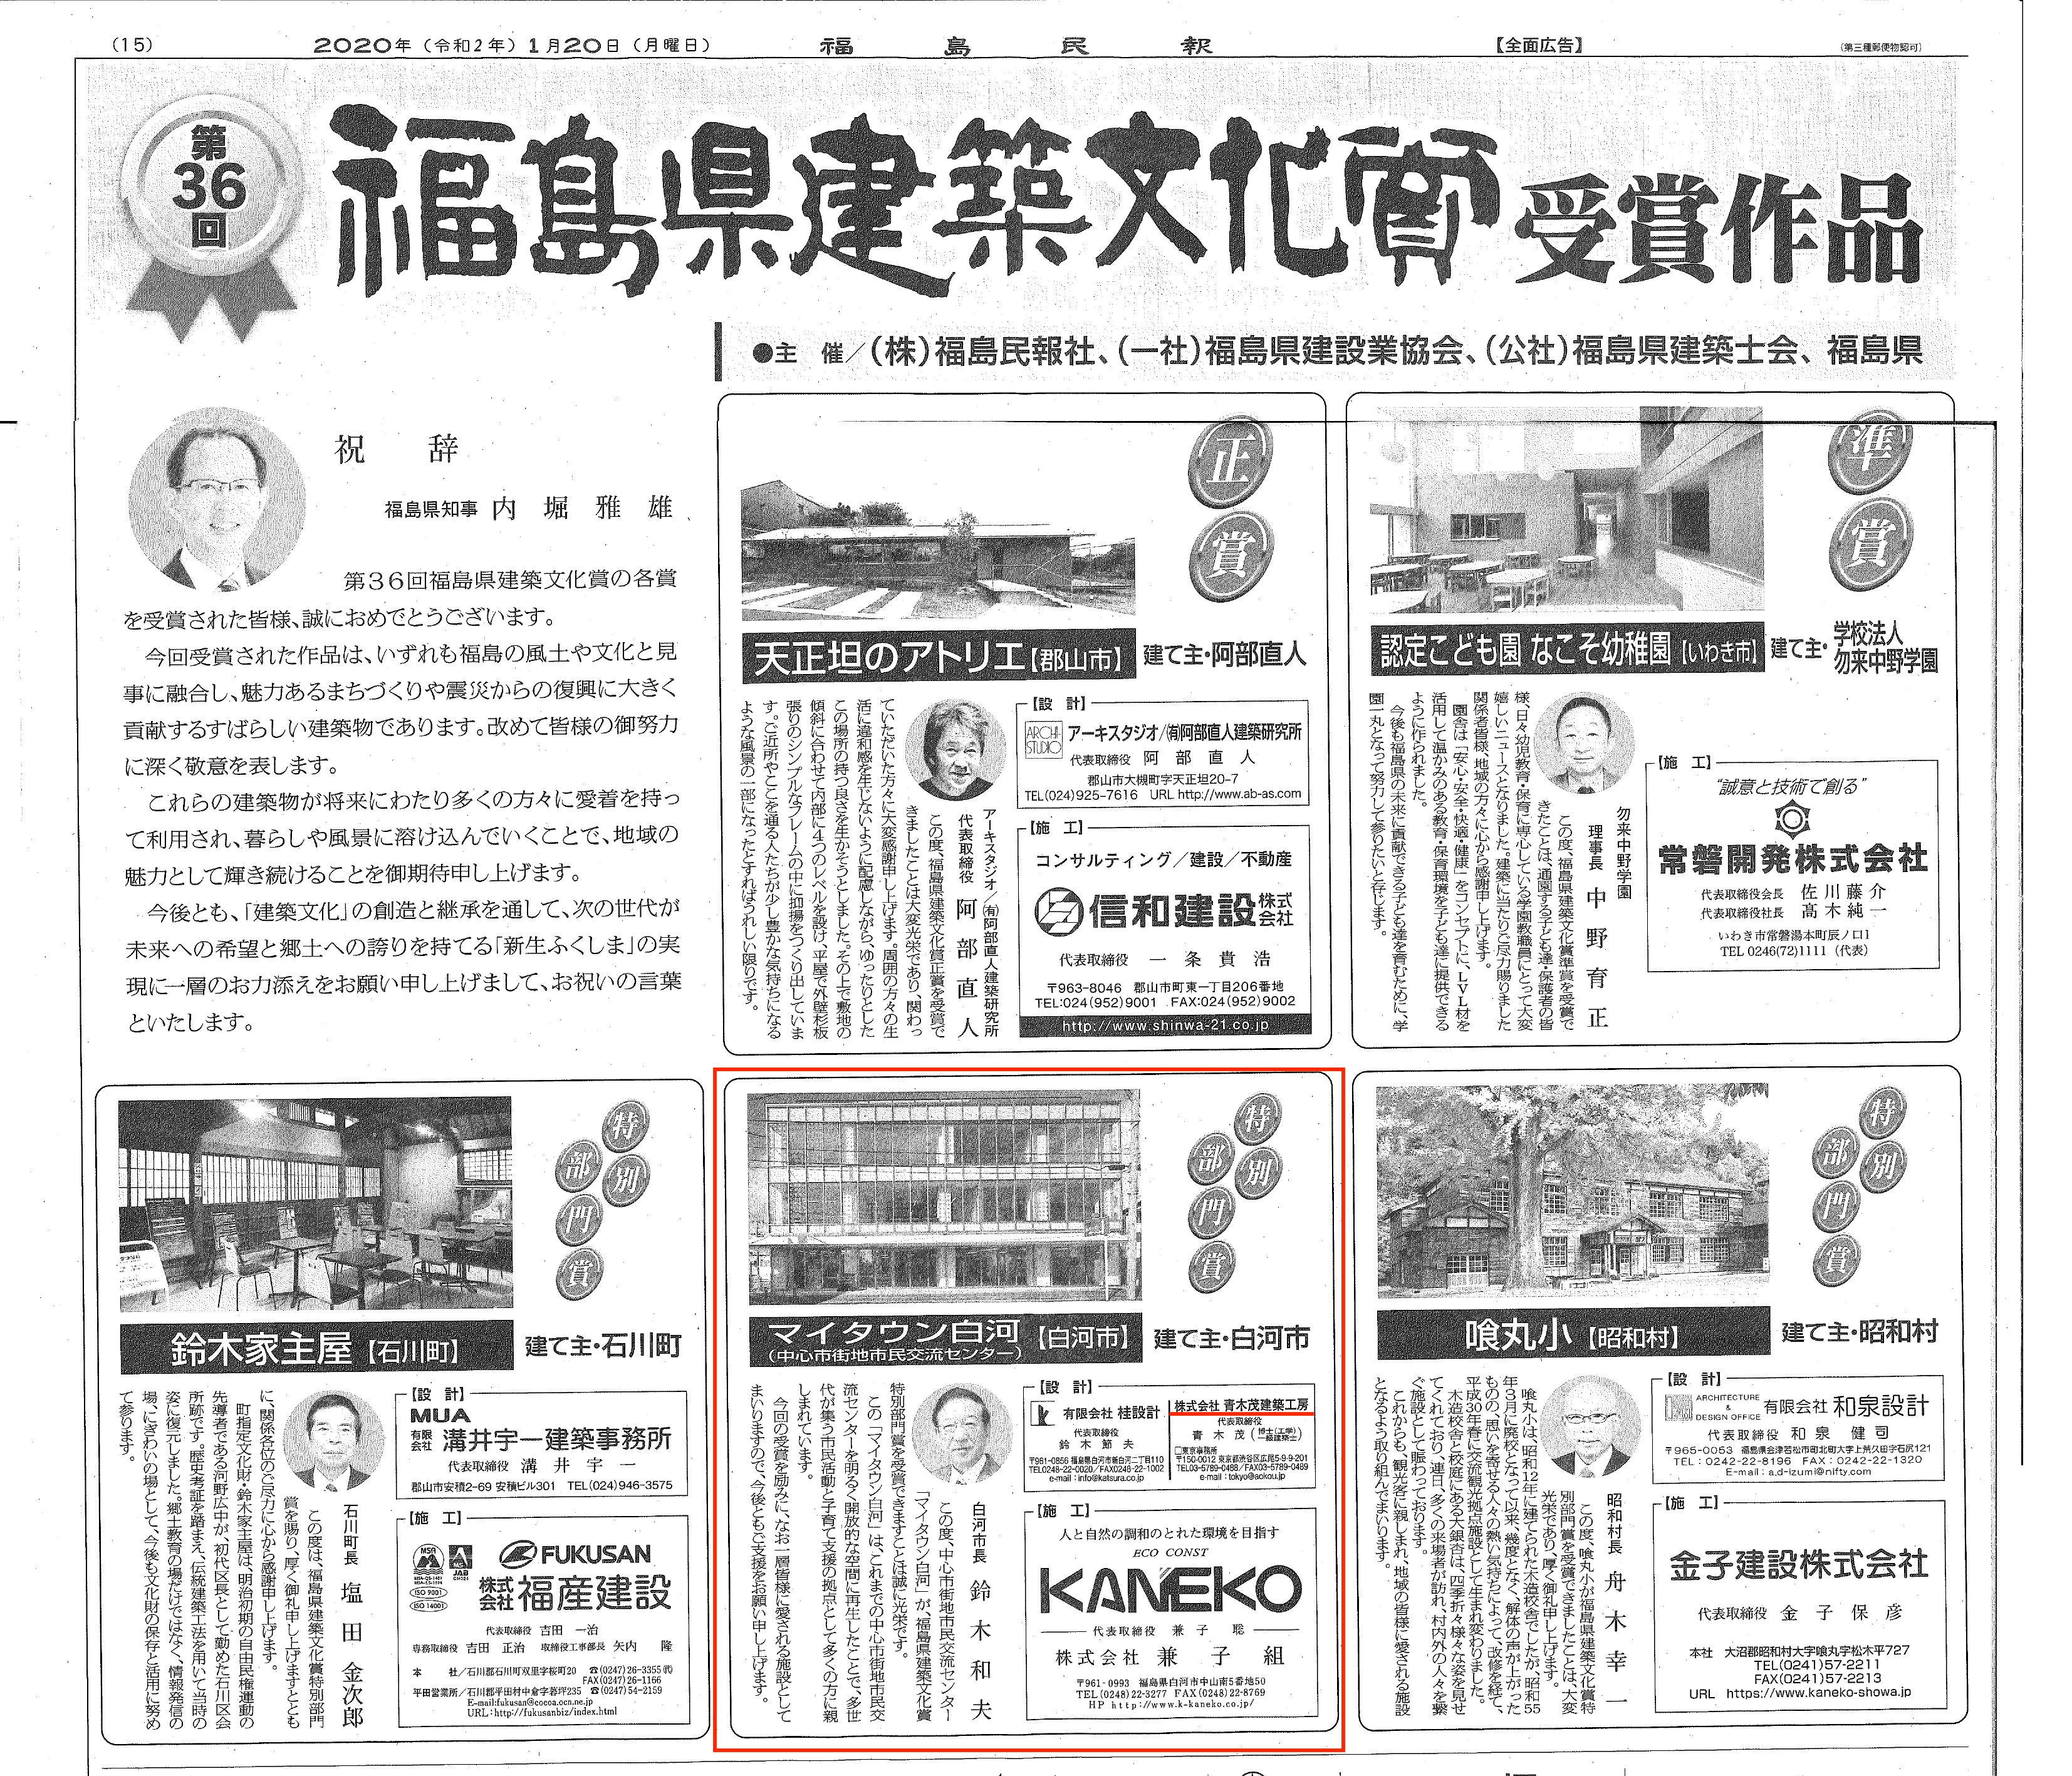 http://aokou.jp/news/images/200123_%E7%99%BD%E6%B2%B3.jpg